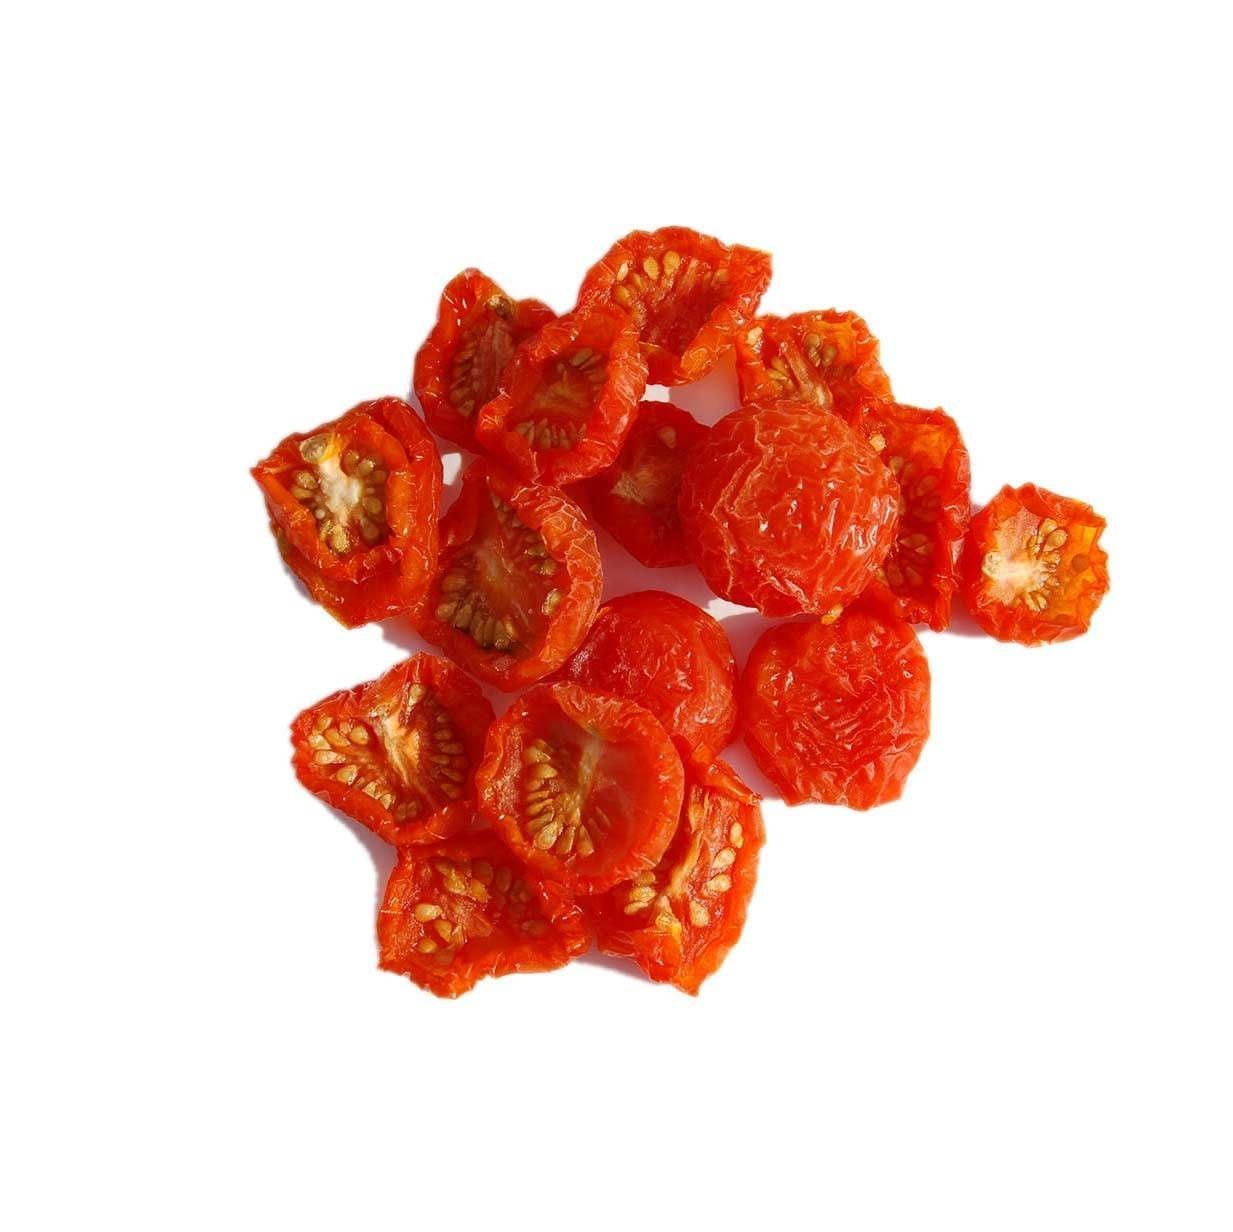 Pomodori Semi Dry